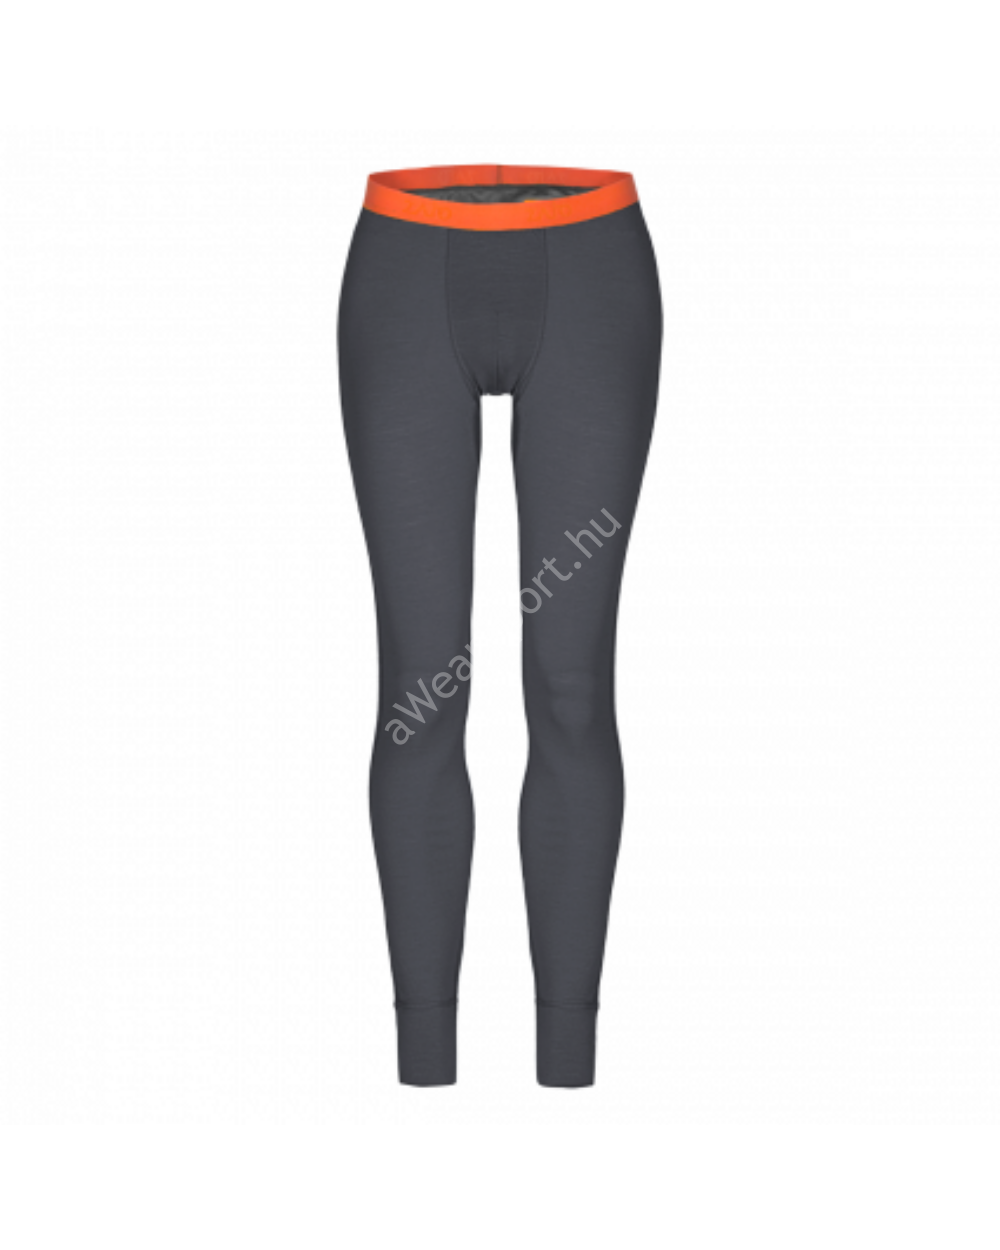 Zajo Bjorn Merino Pants férfi merinói gyapjú aláöltözet nadrág, szürke